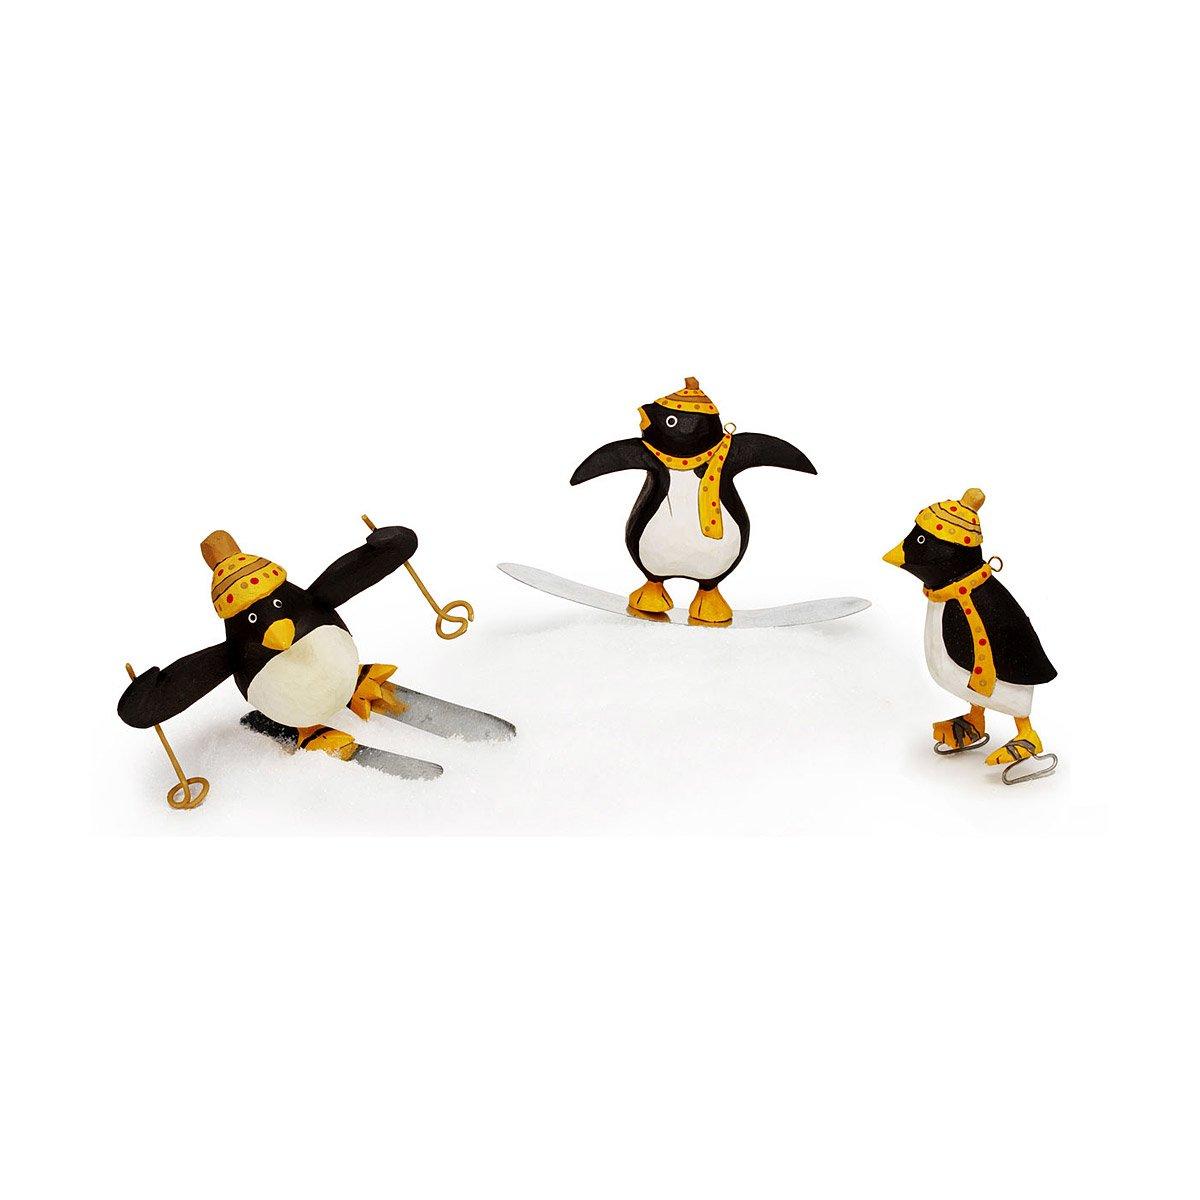 winter sports penguin ornament set | Penguins Christmas Ornaments ...